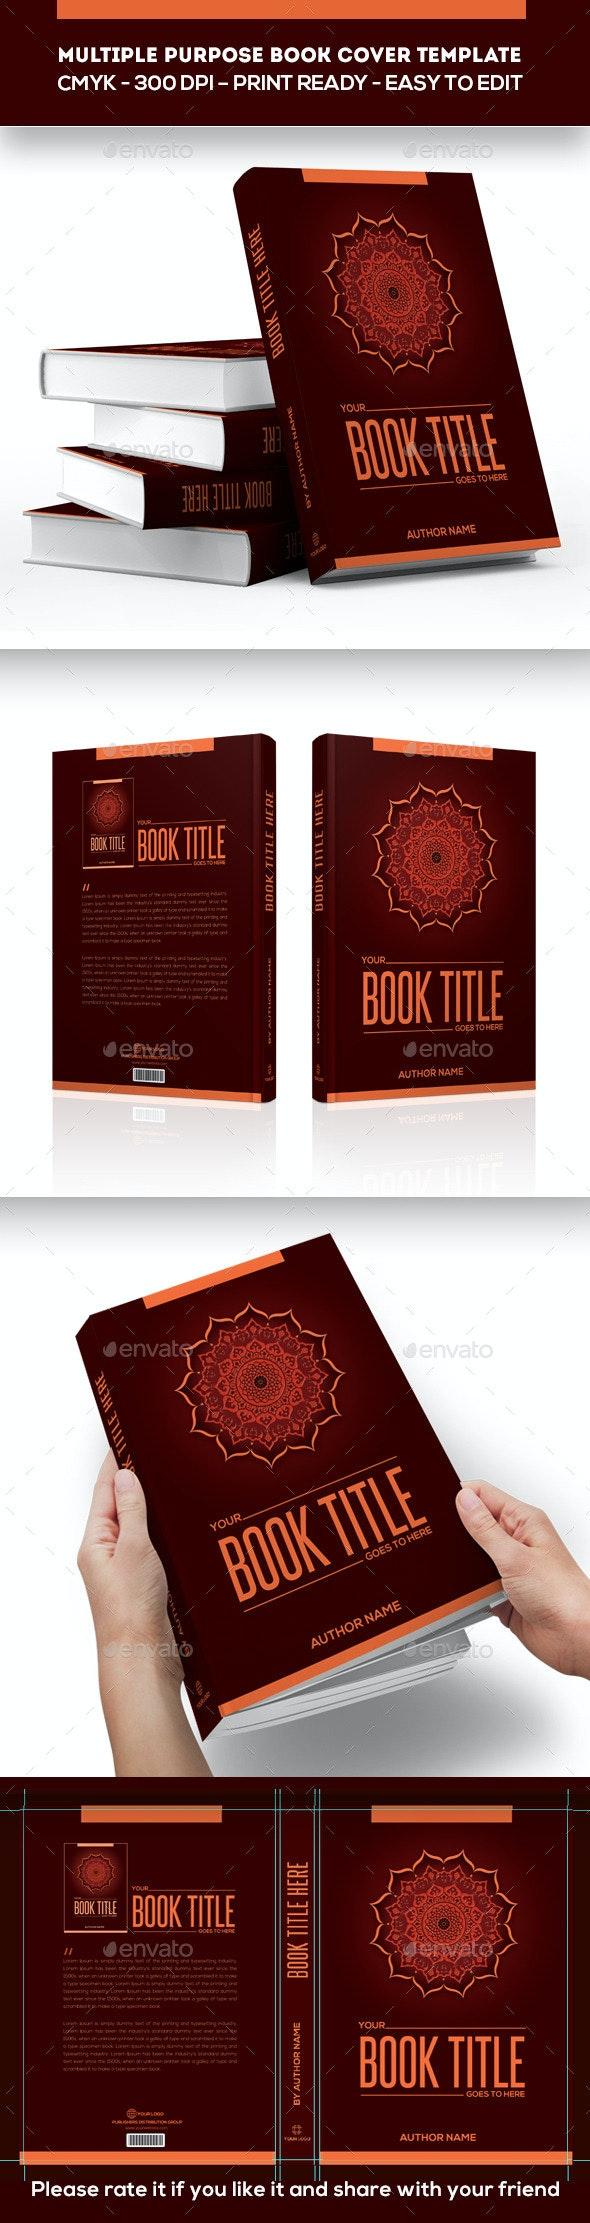 Multiple Purpose Book Cover Template - Print Templates